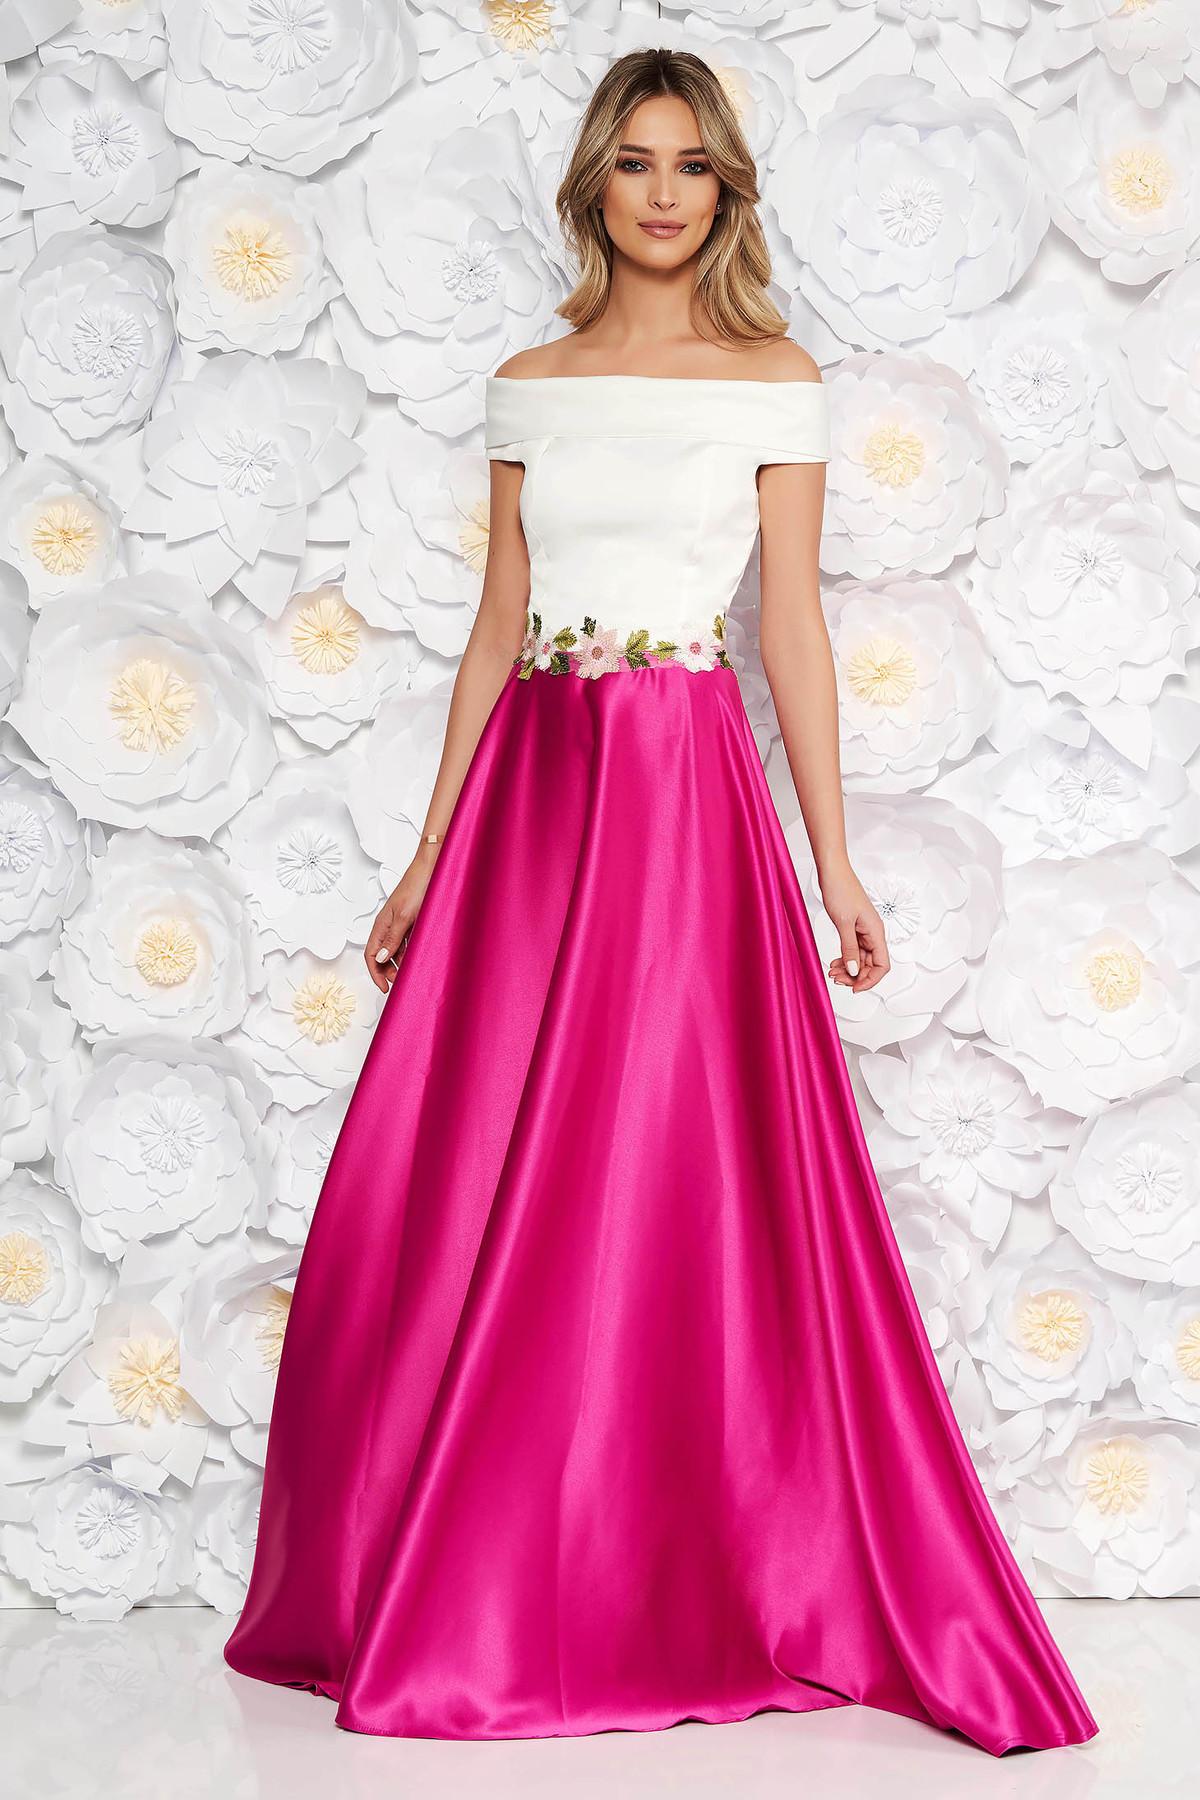 Rochie Artista roz de ocazie in clos din material satinat cu insertii de broderie